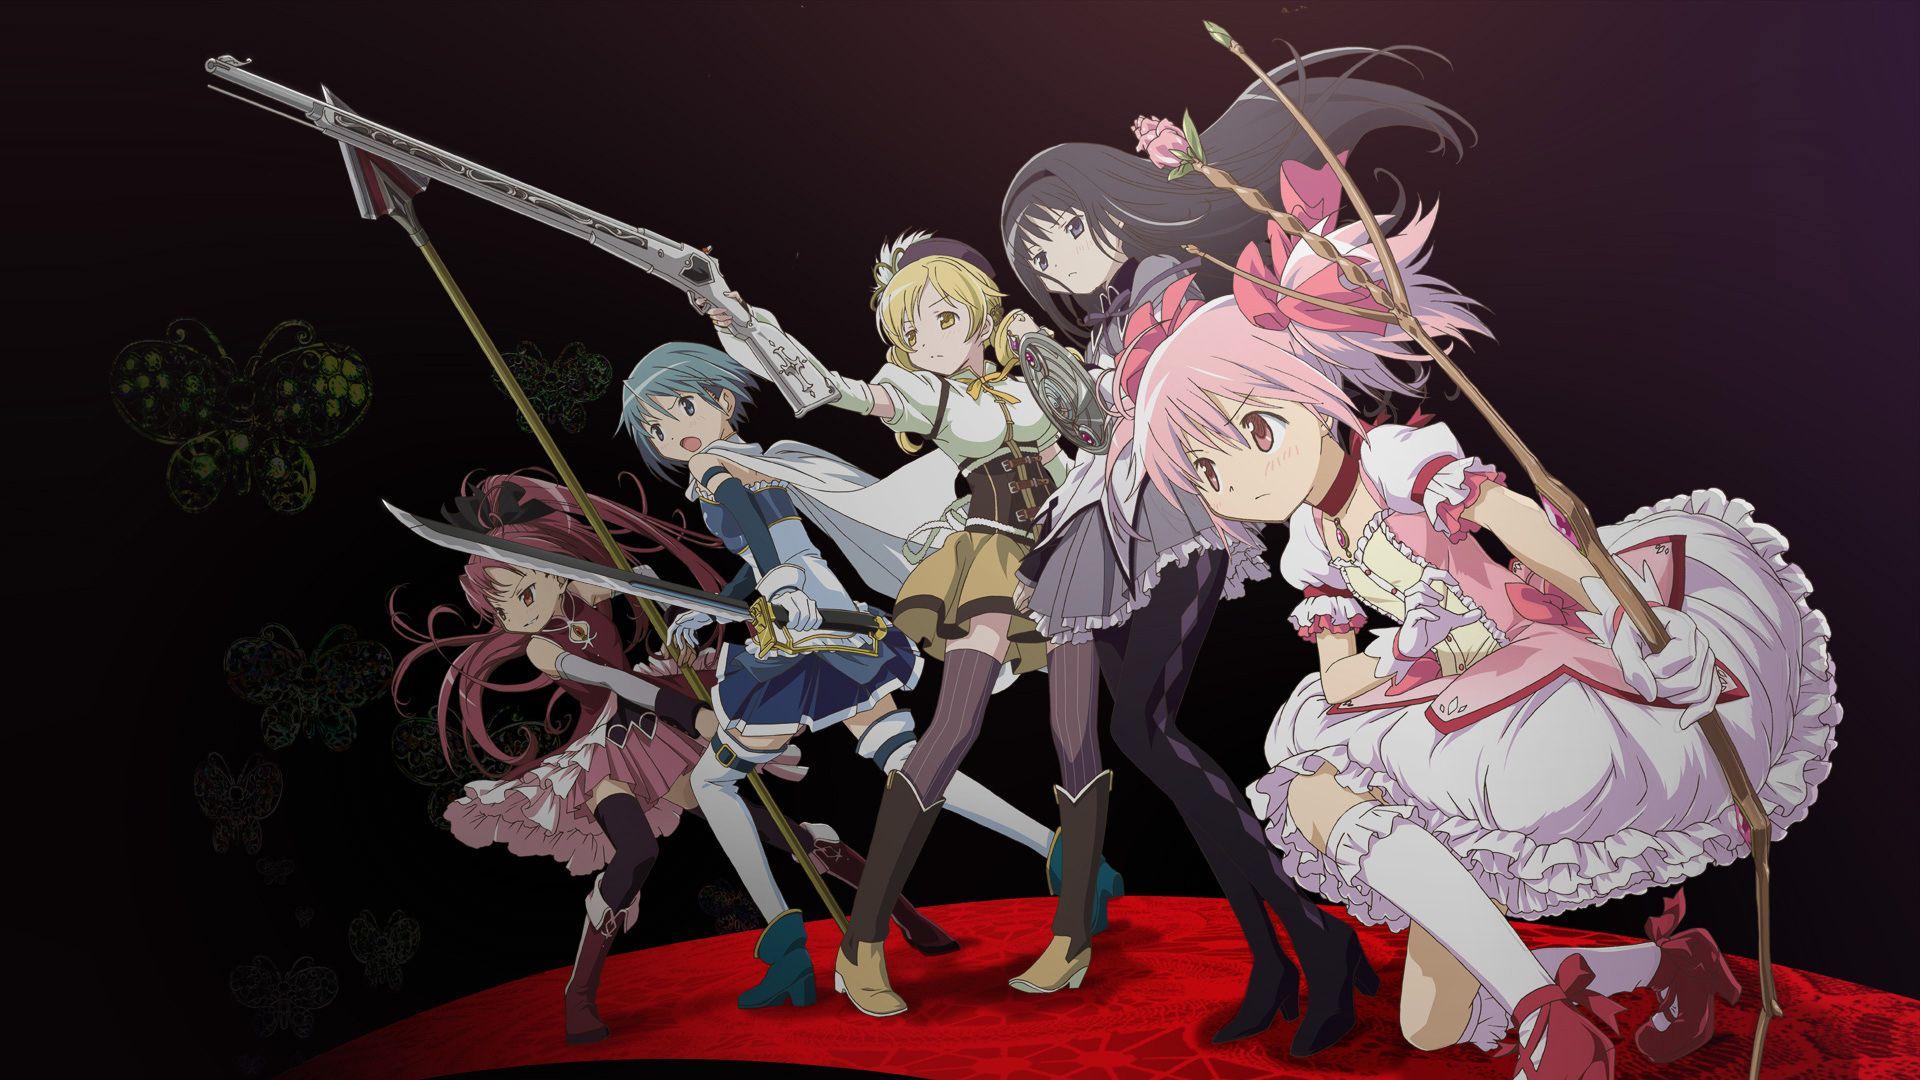 Puella Magi Madoka Magica Wallpaper Madoka Magica Anime Magi Anime